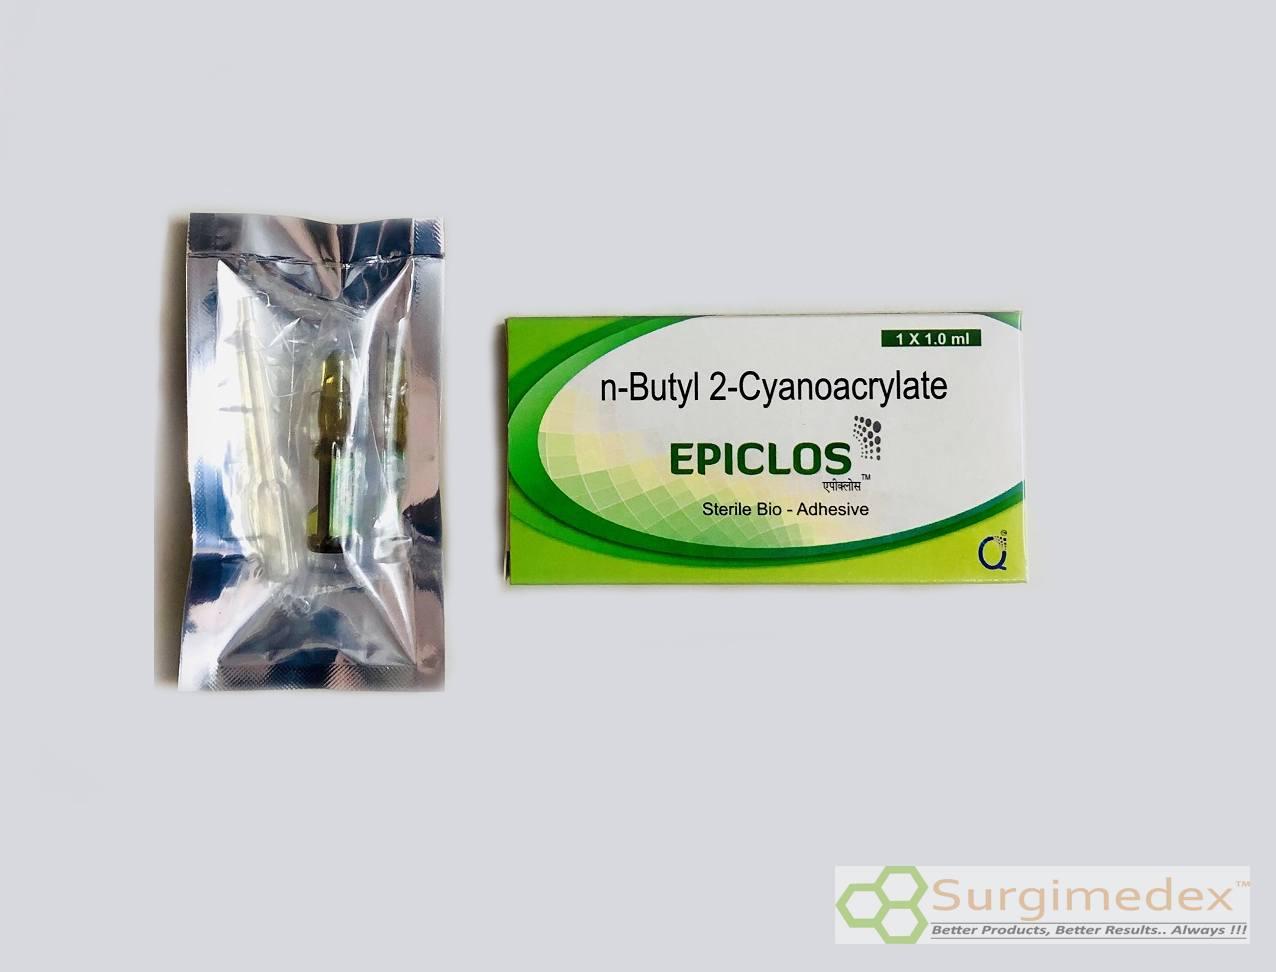 Sterile Bio Adhesive, Tissue sealer, Tissue Adhesive – N-Butyl 2-Cyanoacrylate Inj. 0.50ml – 1.0ml